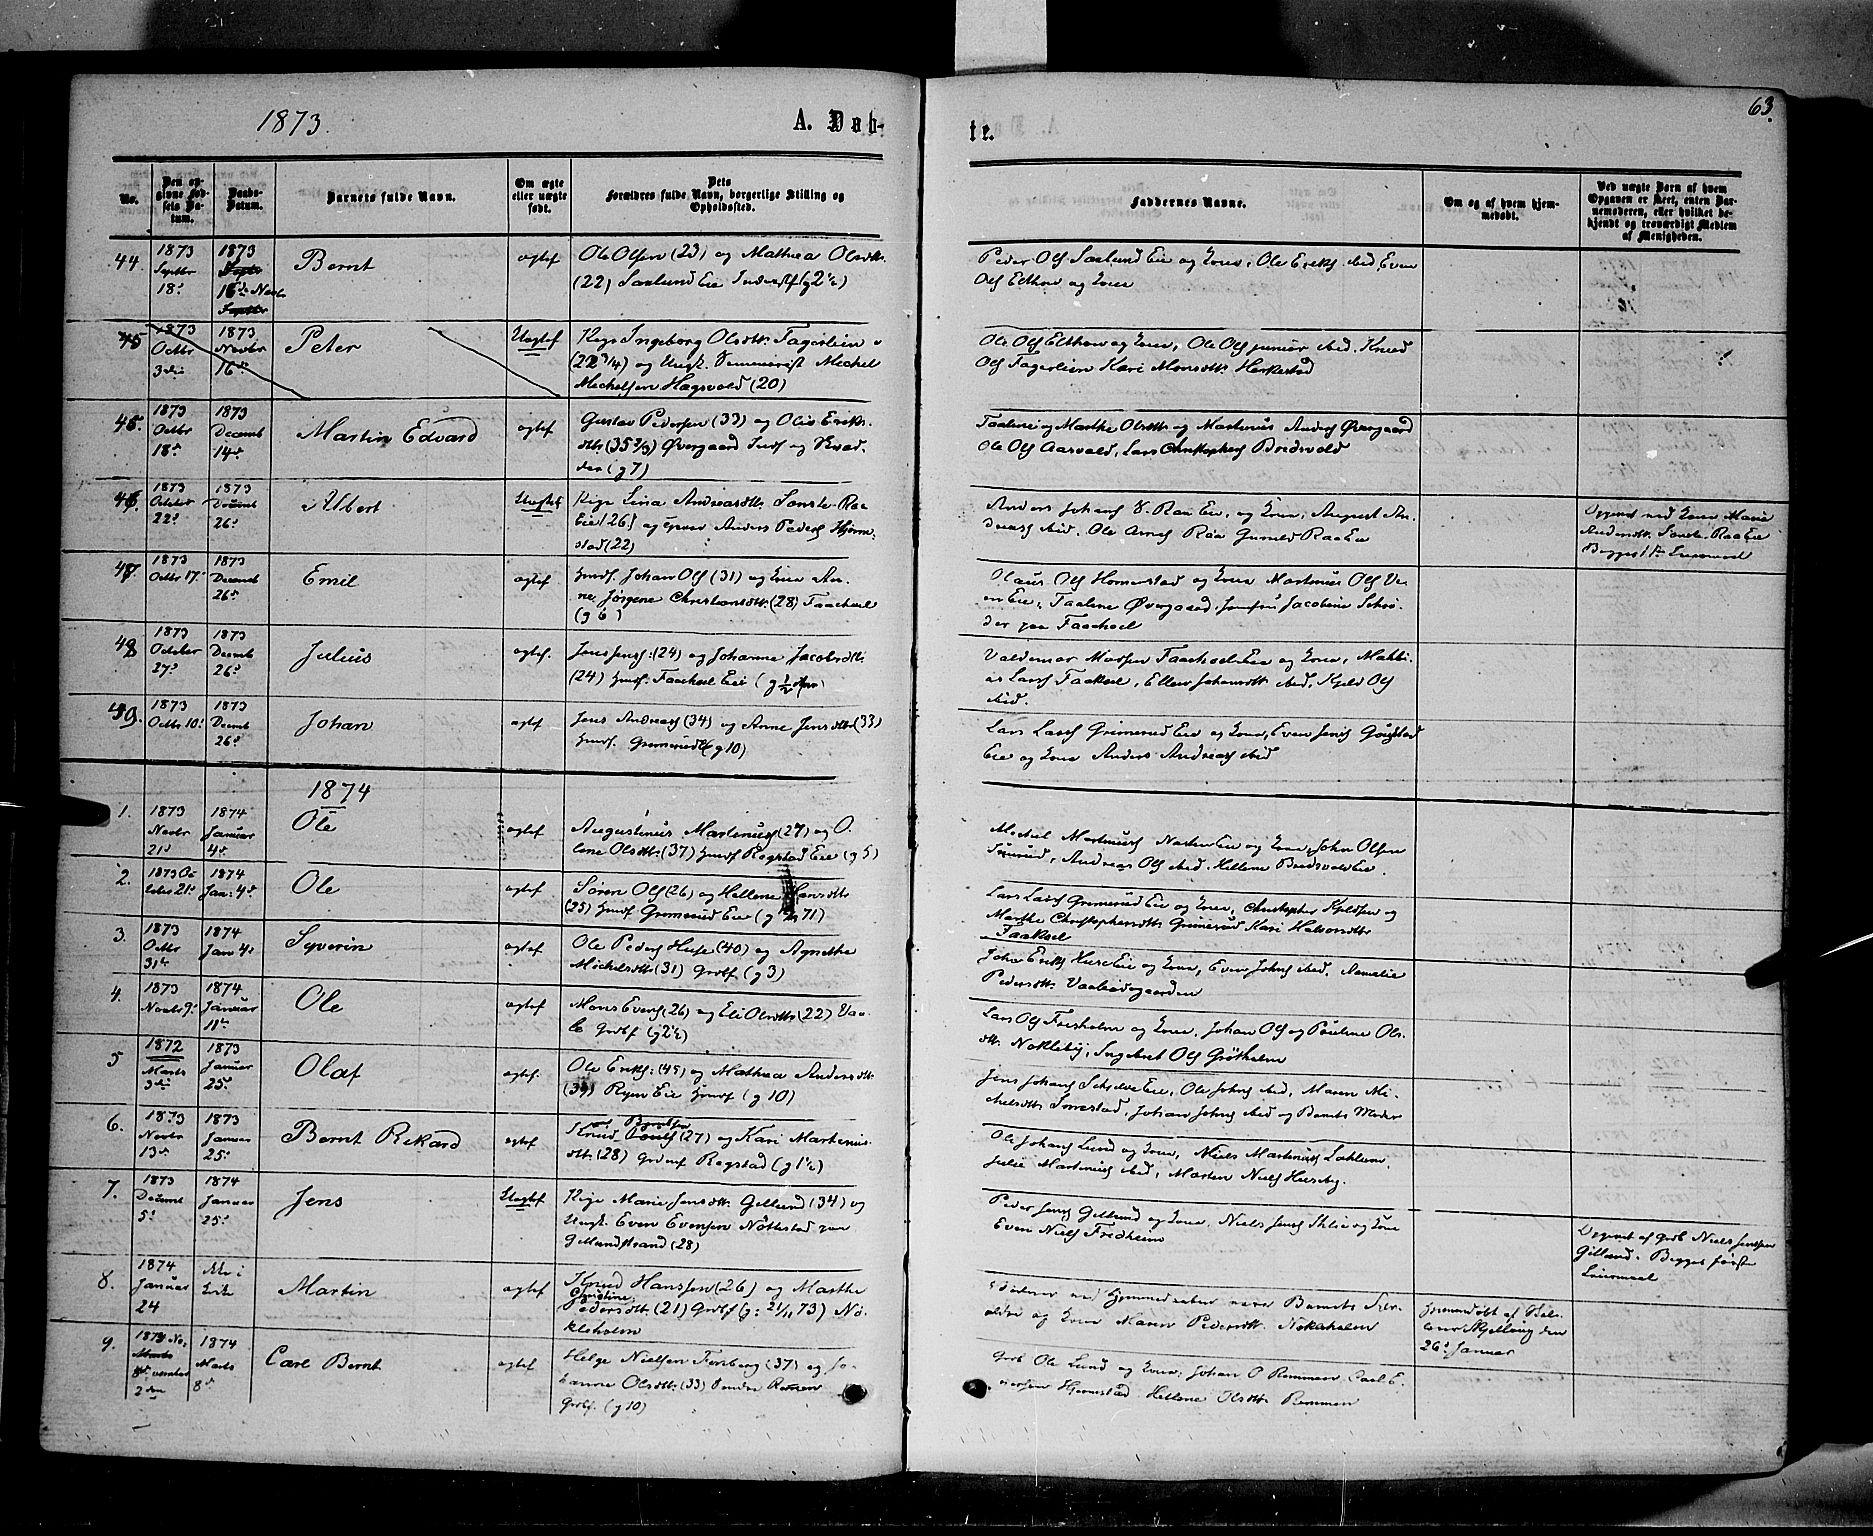 SAH, Stange prestekontor, K/L0013: Ministerialbok nr. 13, 1862-1879, s. 63